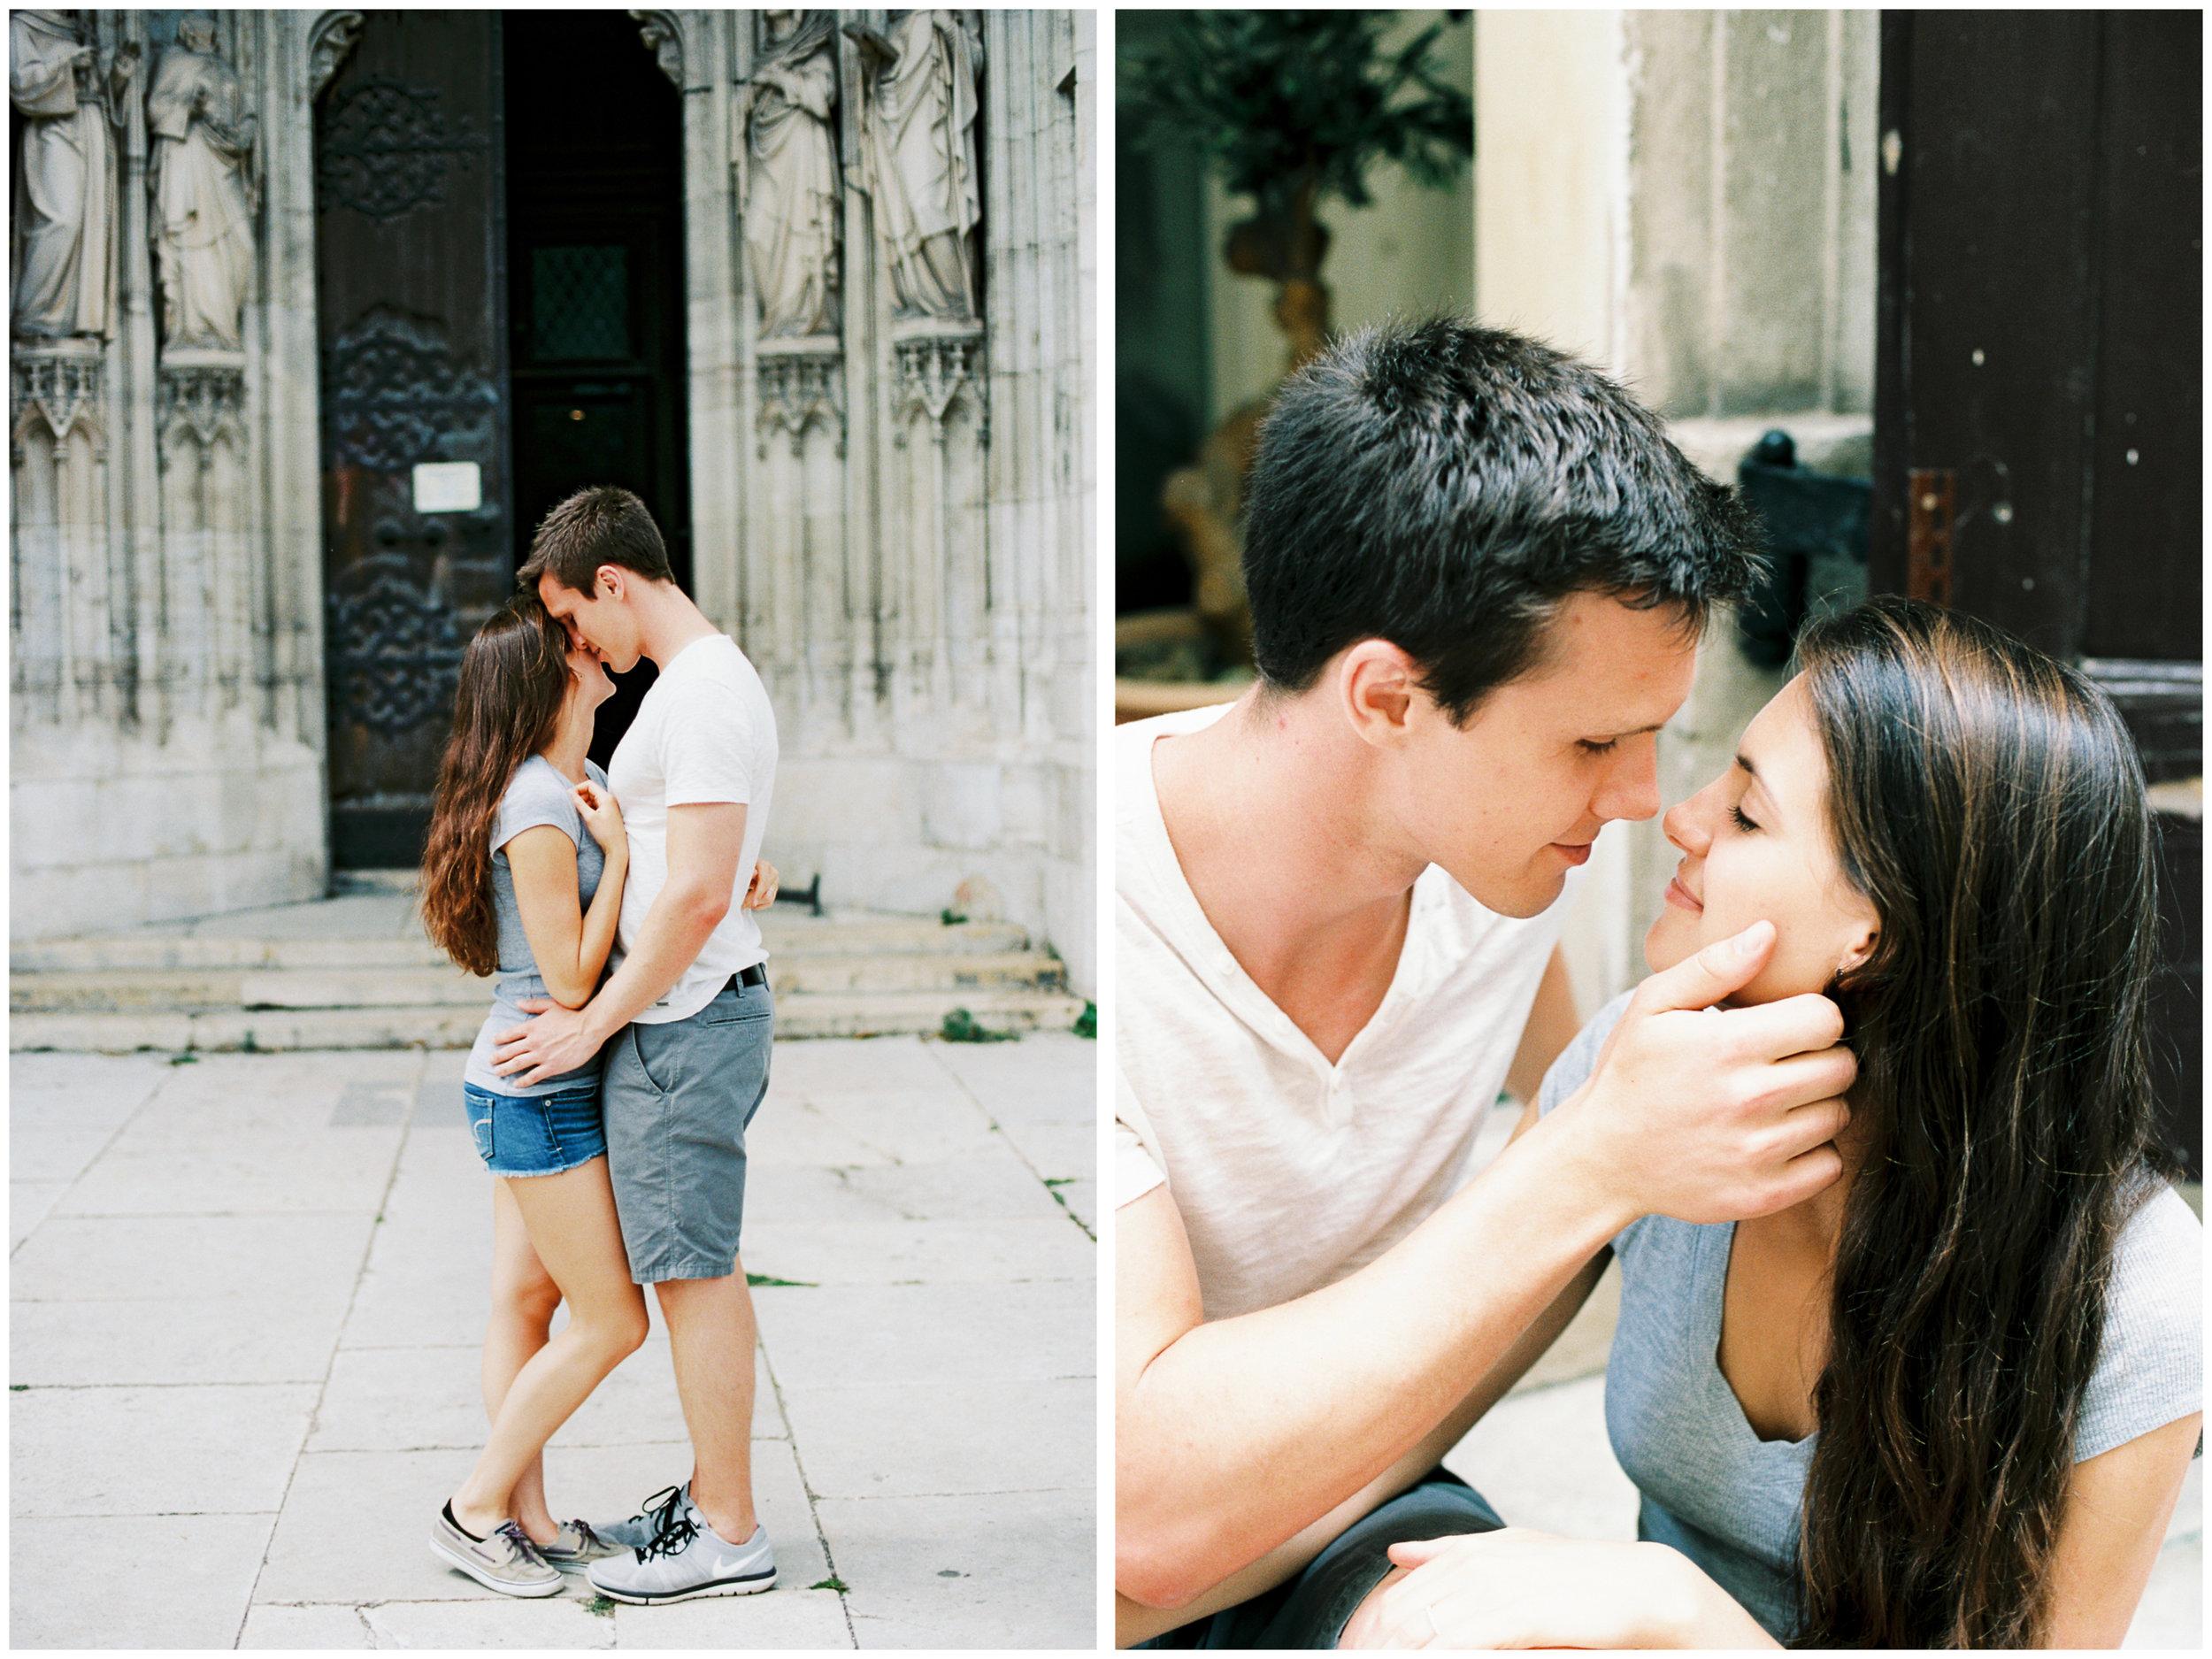 Engagement Portraits | Vienna, Austria | Michelle Mock Photography | Vienna Portrait Photographer | Vienna Film Photographer | Canon 1V | Portra 160